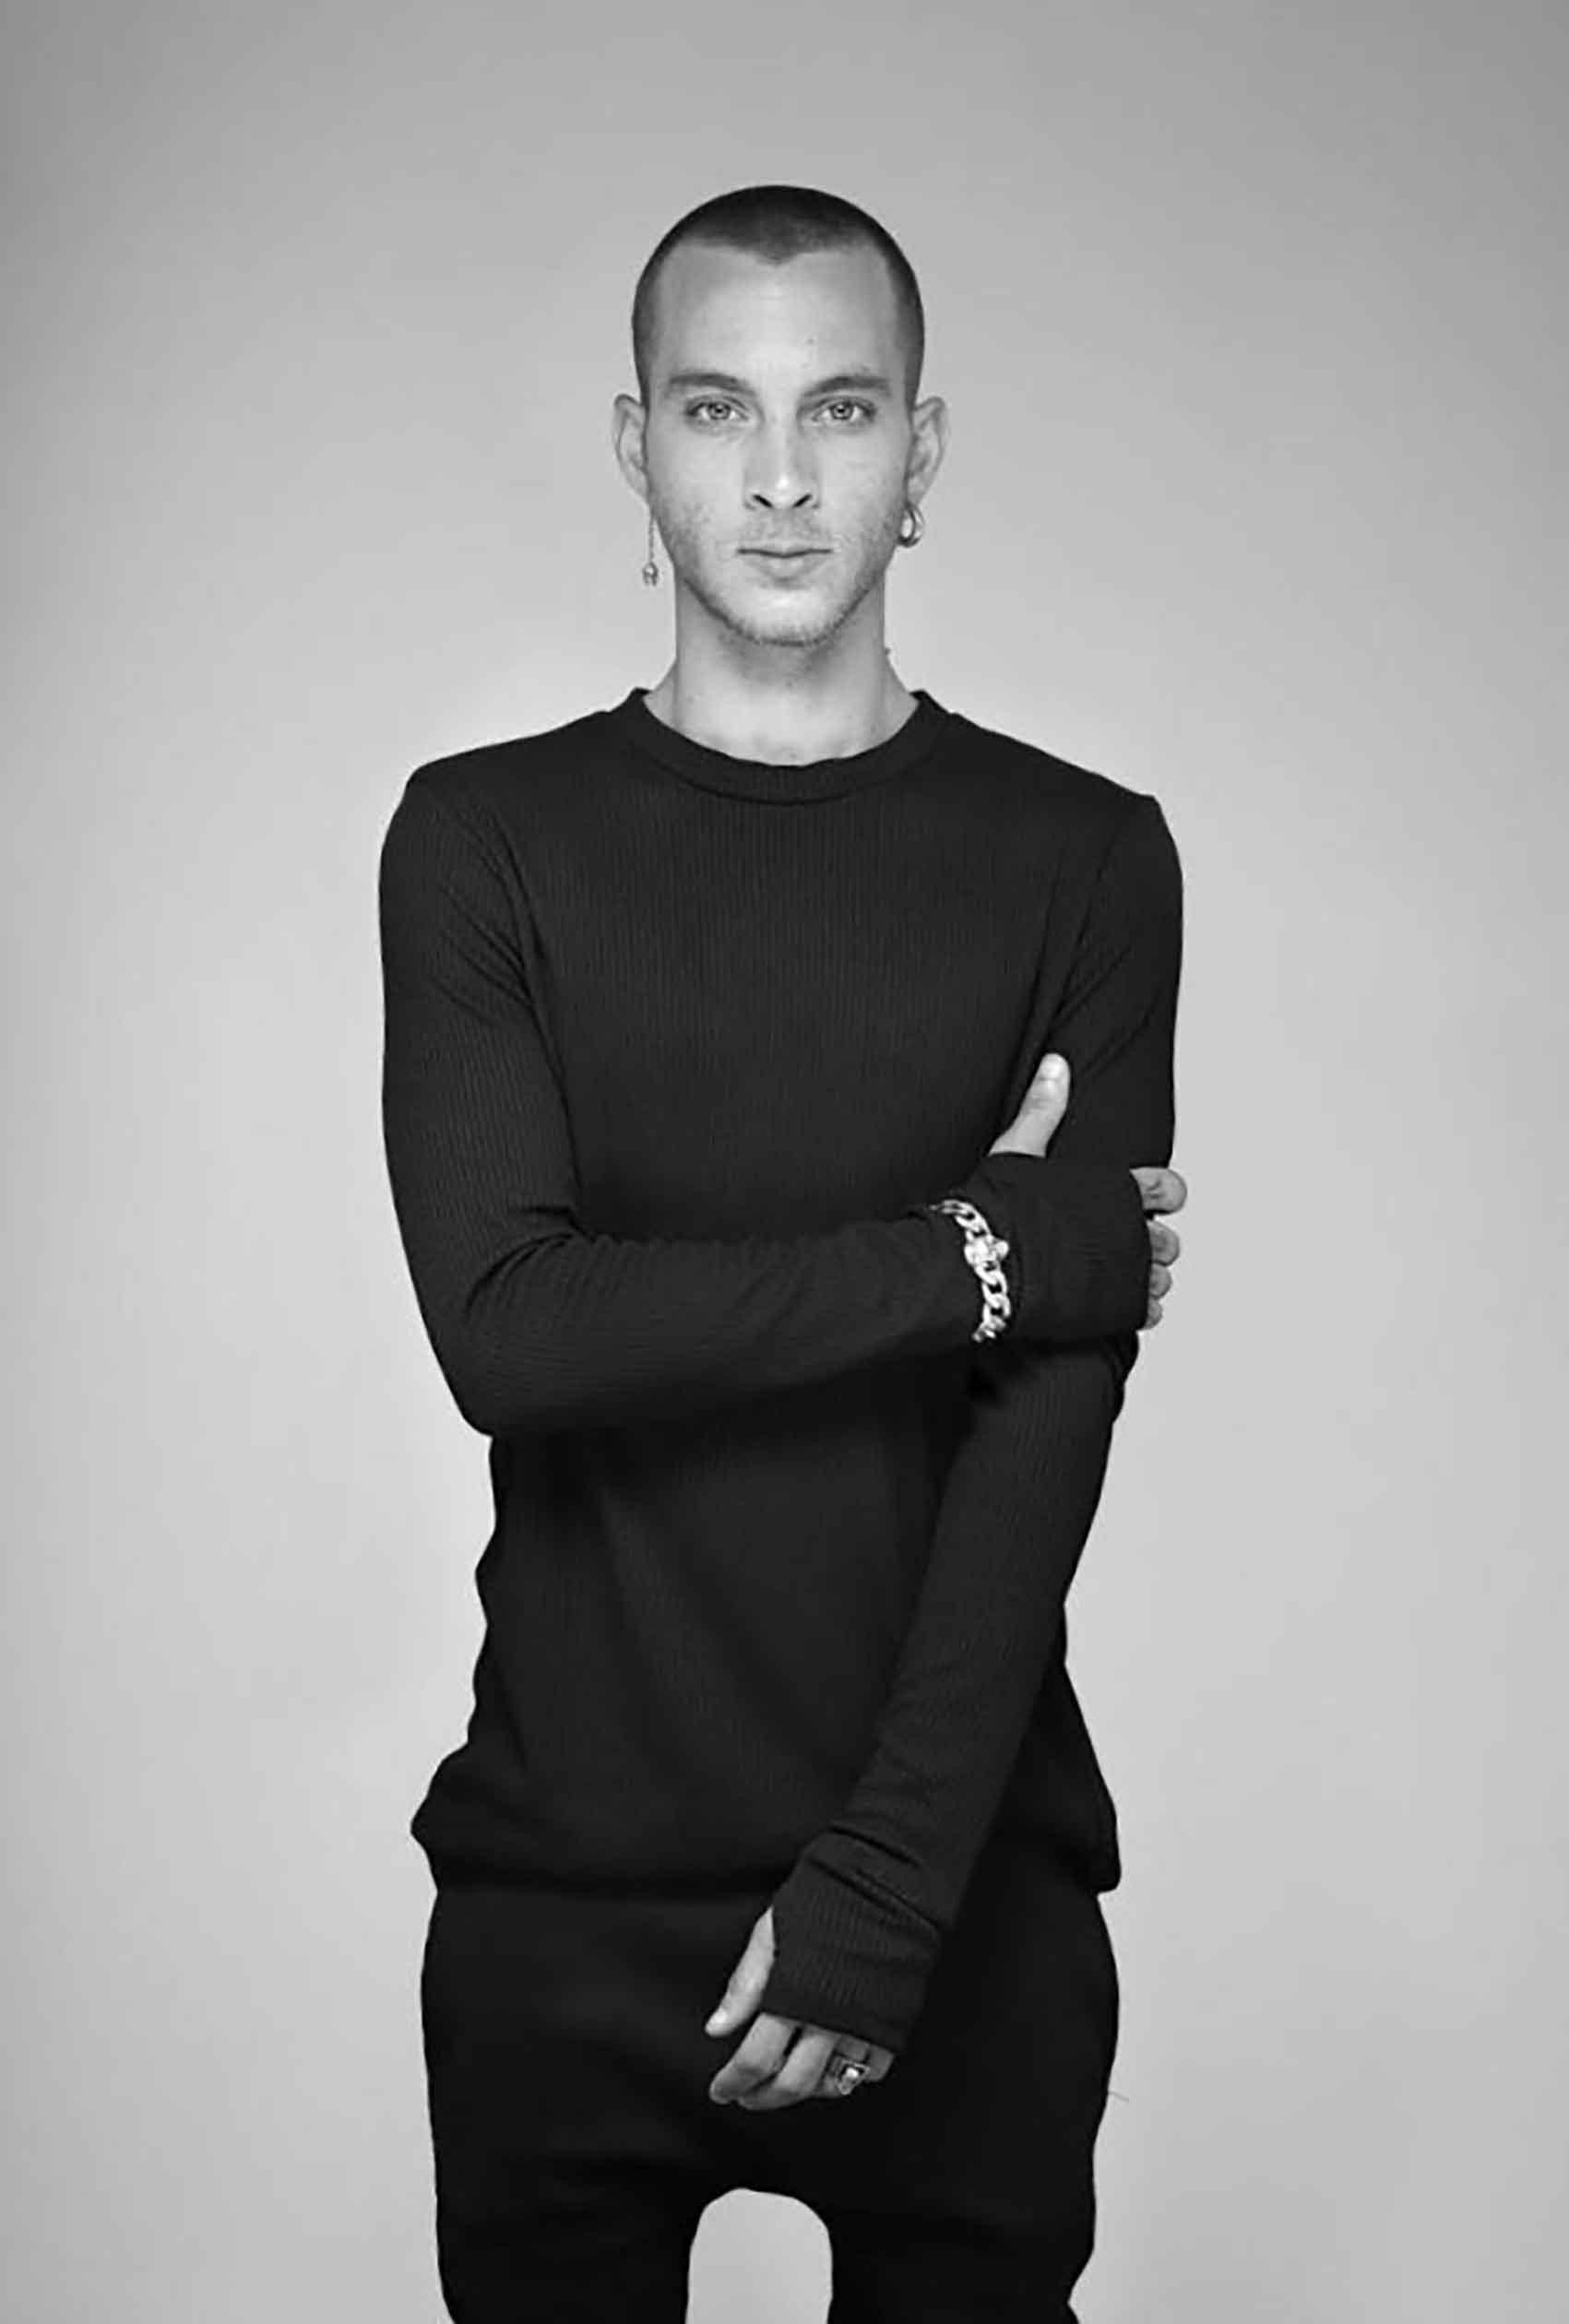 BLAC-L,-מעצבת-אופנה,-לילך-עוזי-אפנת-גברים